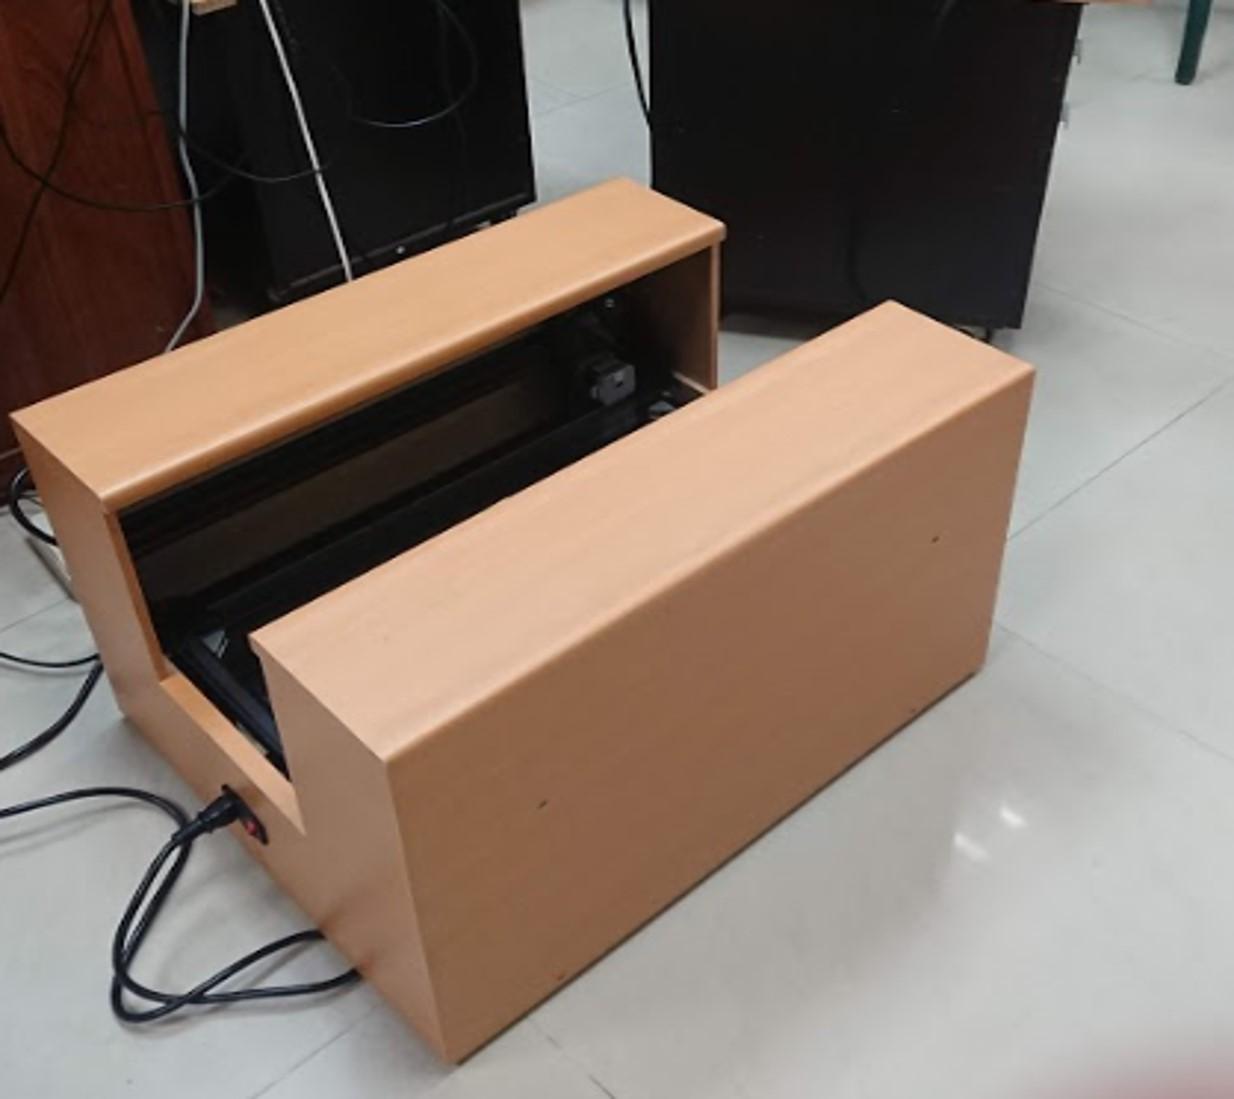 Fast 3D foot scanner